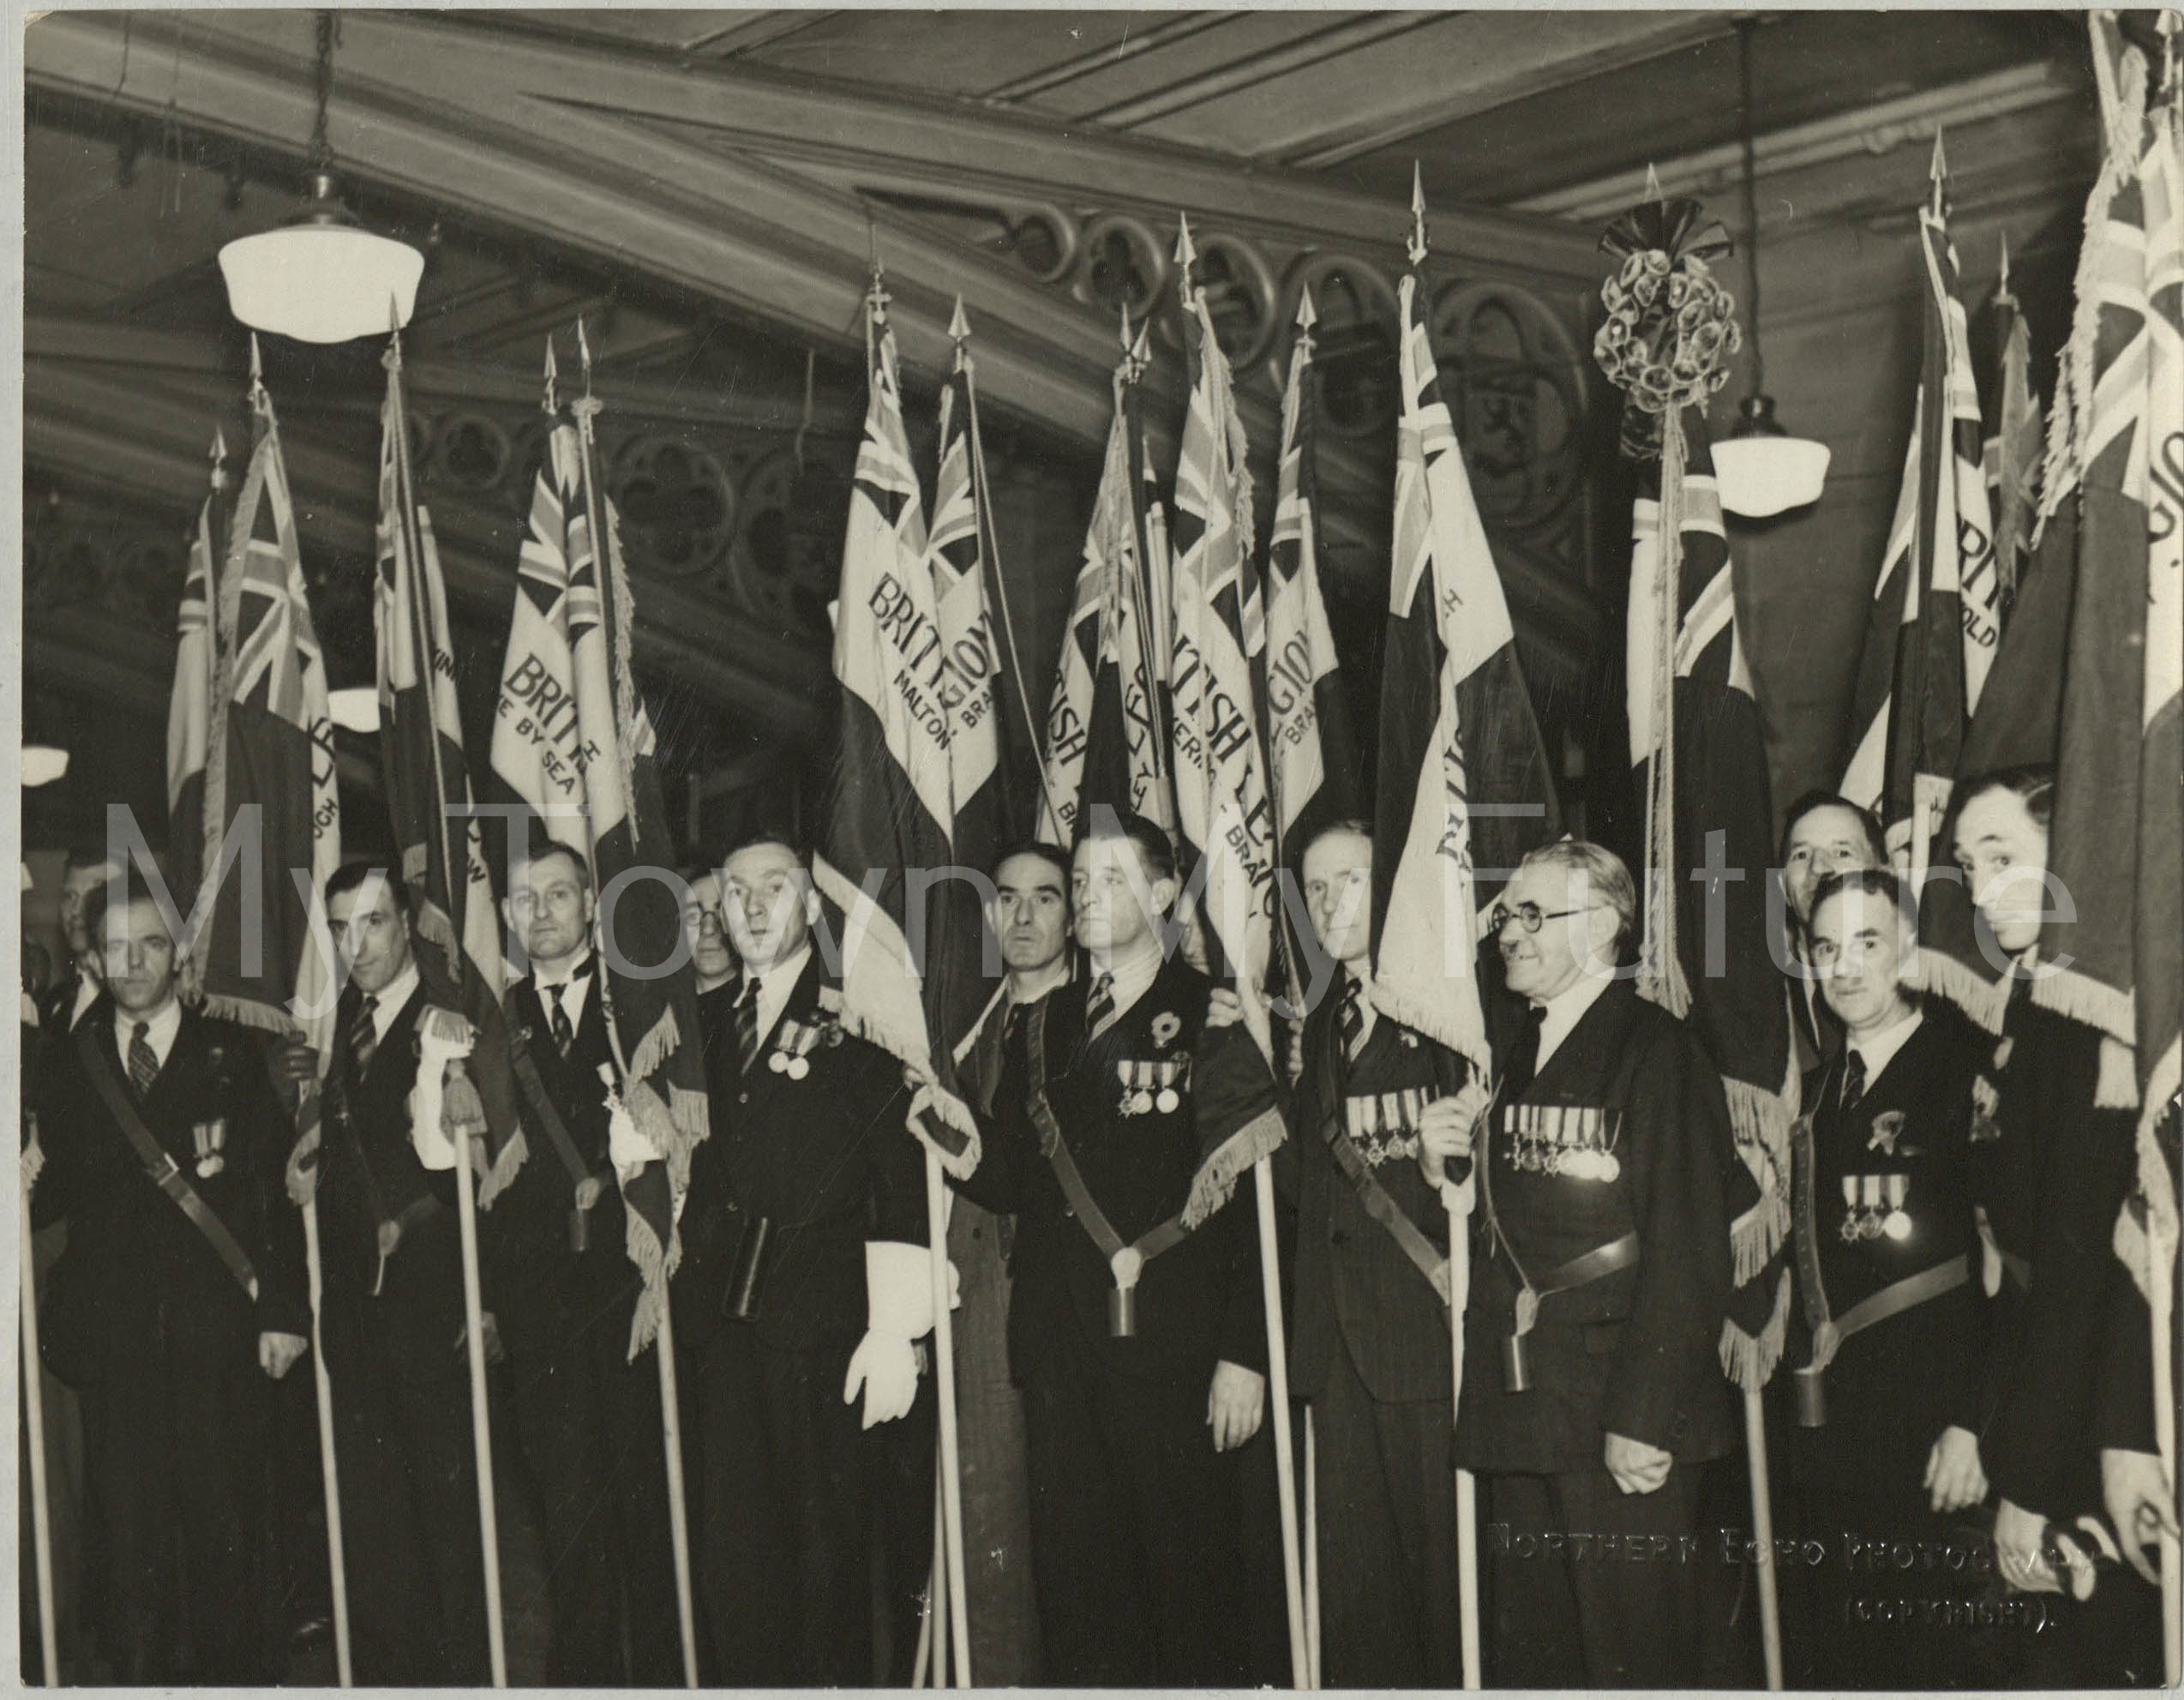 Royal British Legion Festival Of Remembrance 1938